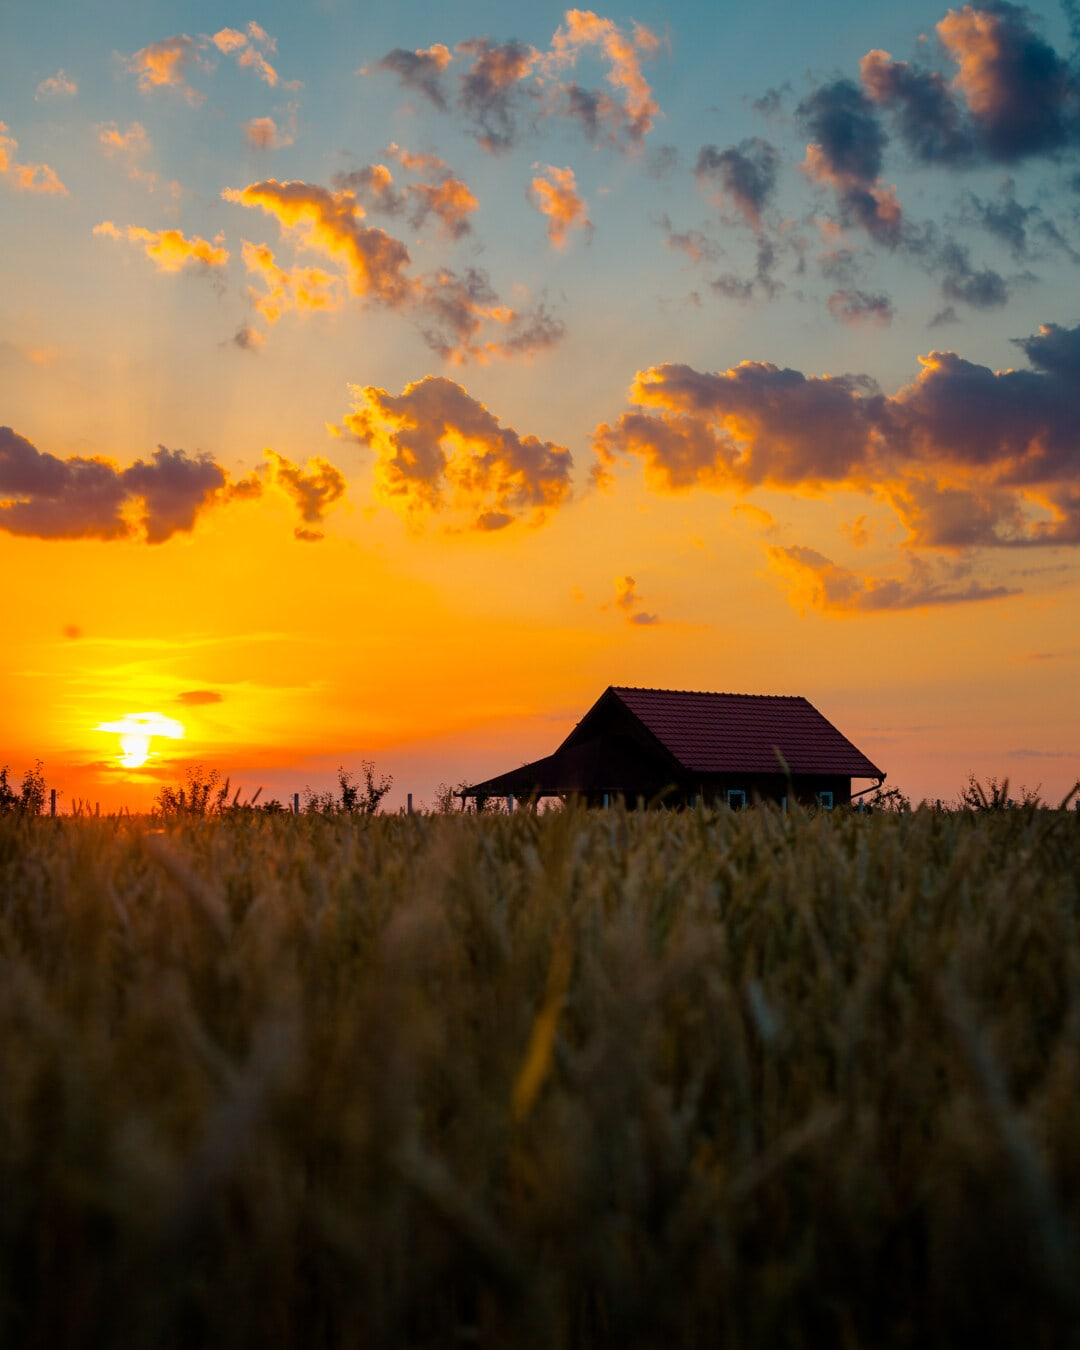 Weizen, Weizenfeld, Bauernhaus, Ackerland, Sonnenuntergang, Landschaft, Sonne, Dämmerung, Struktur, Landschaft